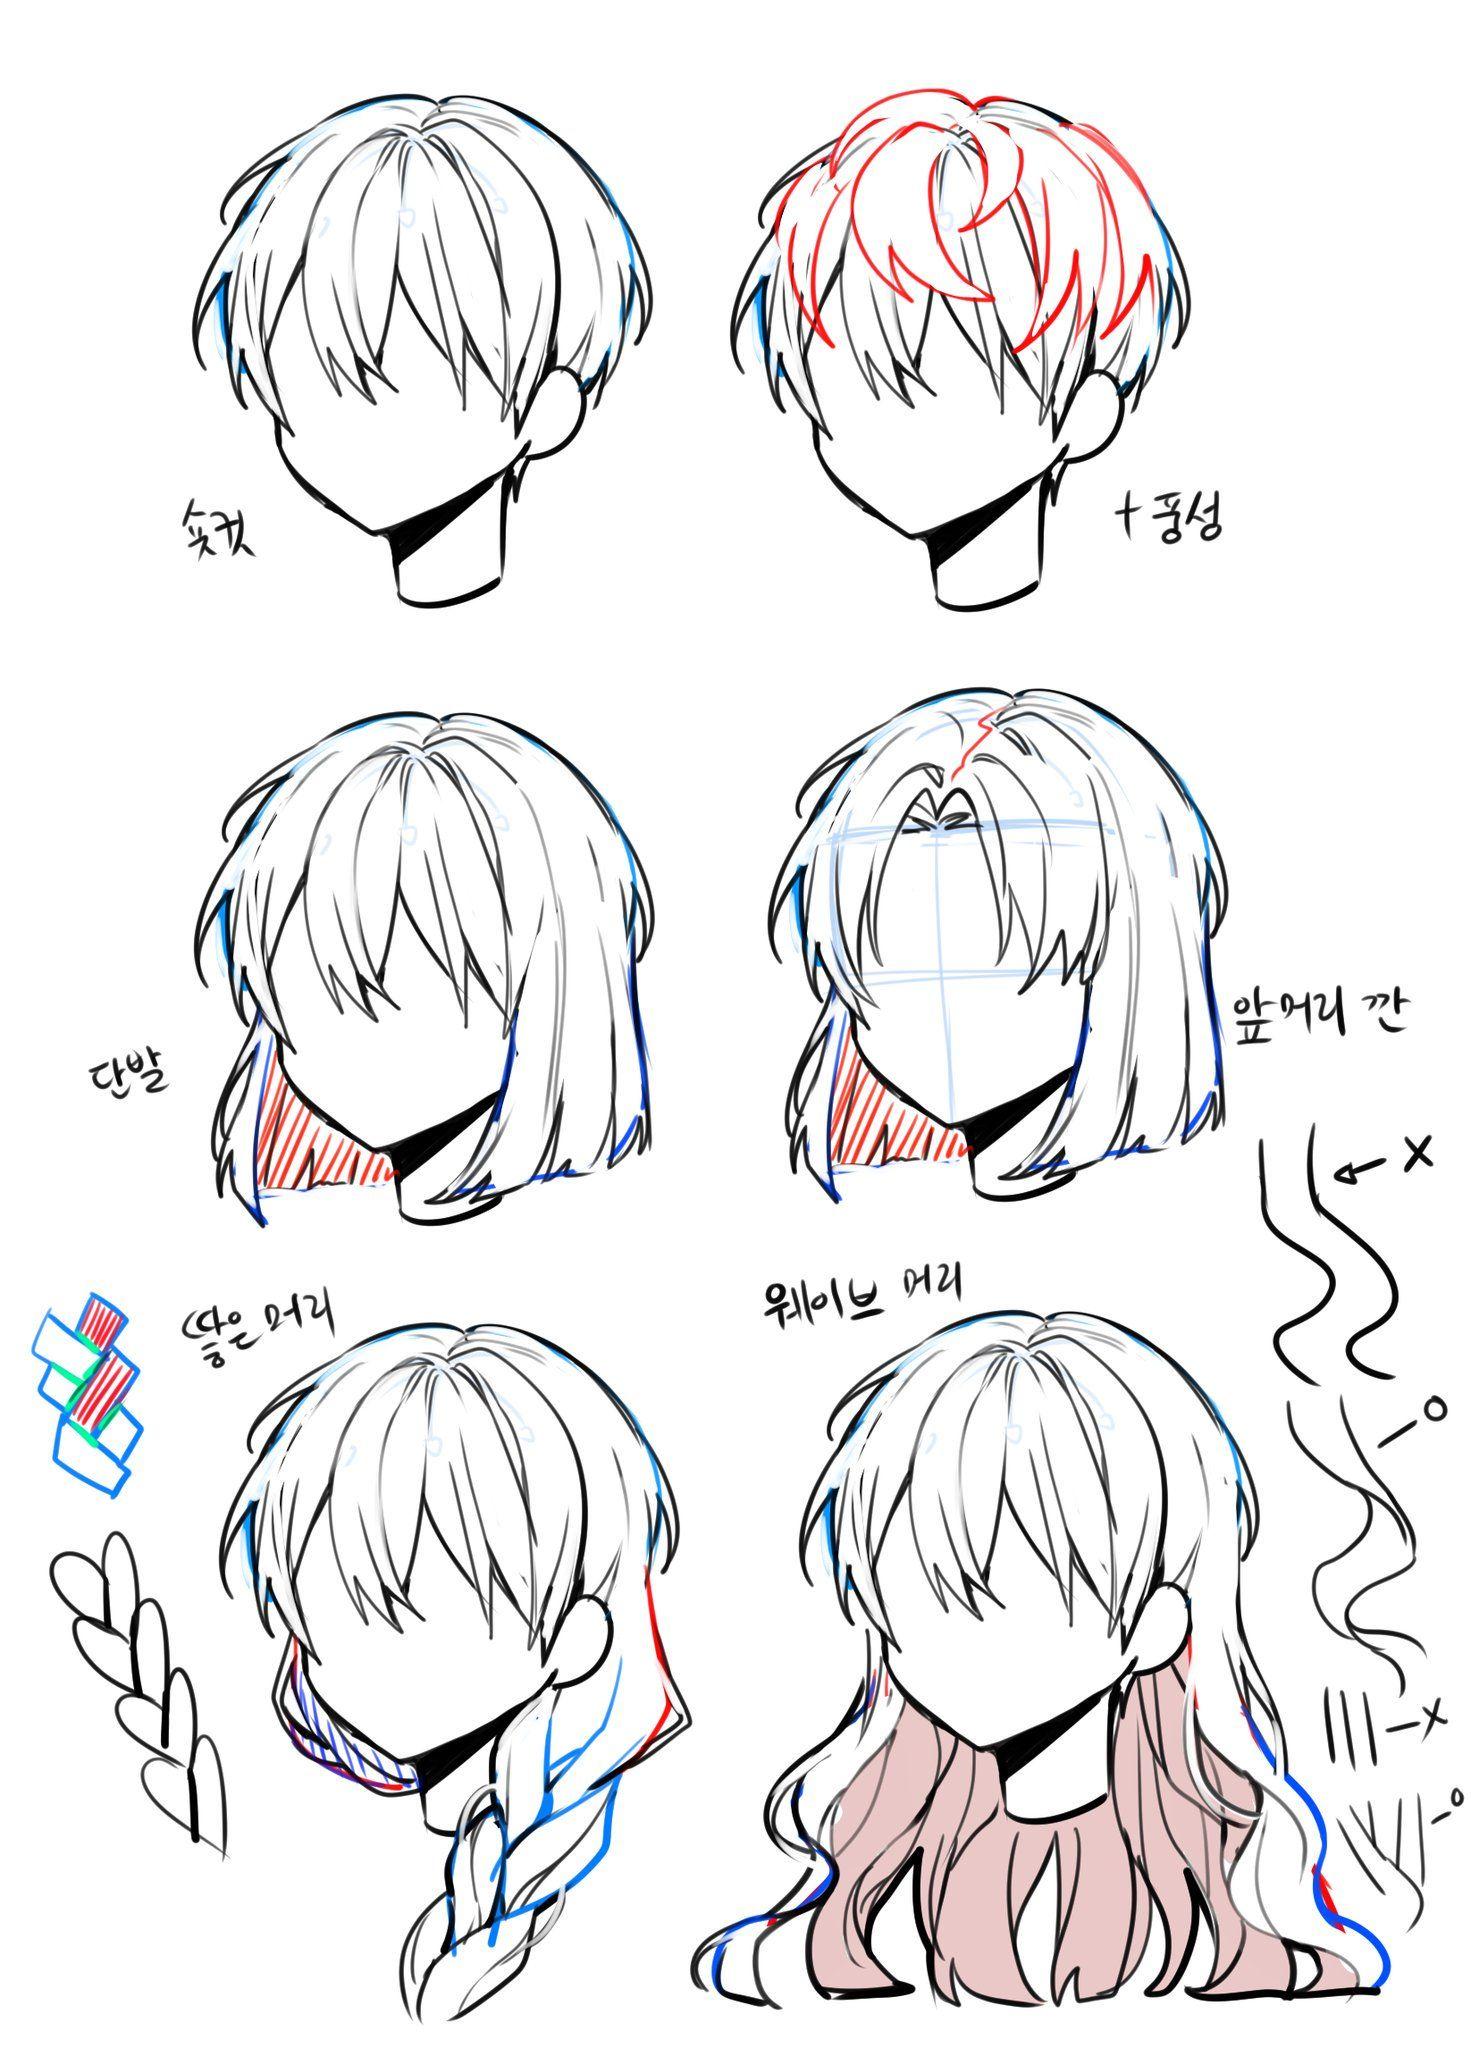 ʚ KKana ɞ on Twitter | 스케치, 드로잉 강좌, 쉬운 스케치